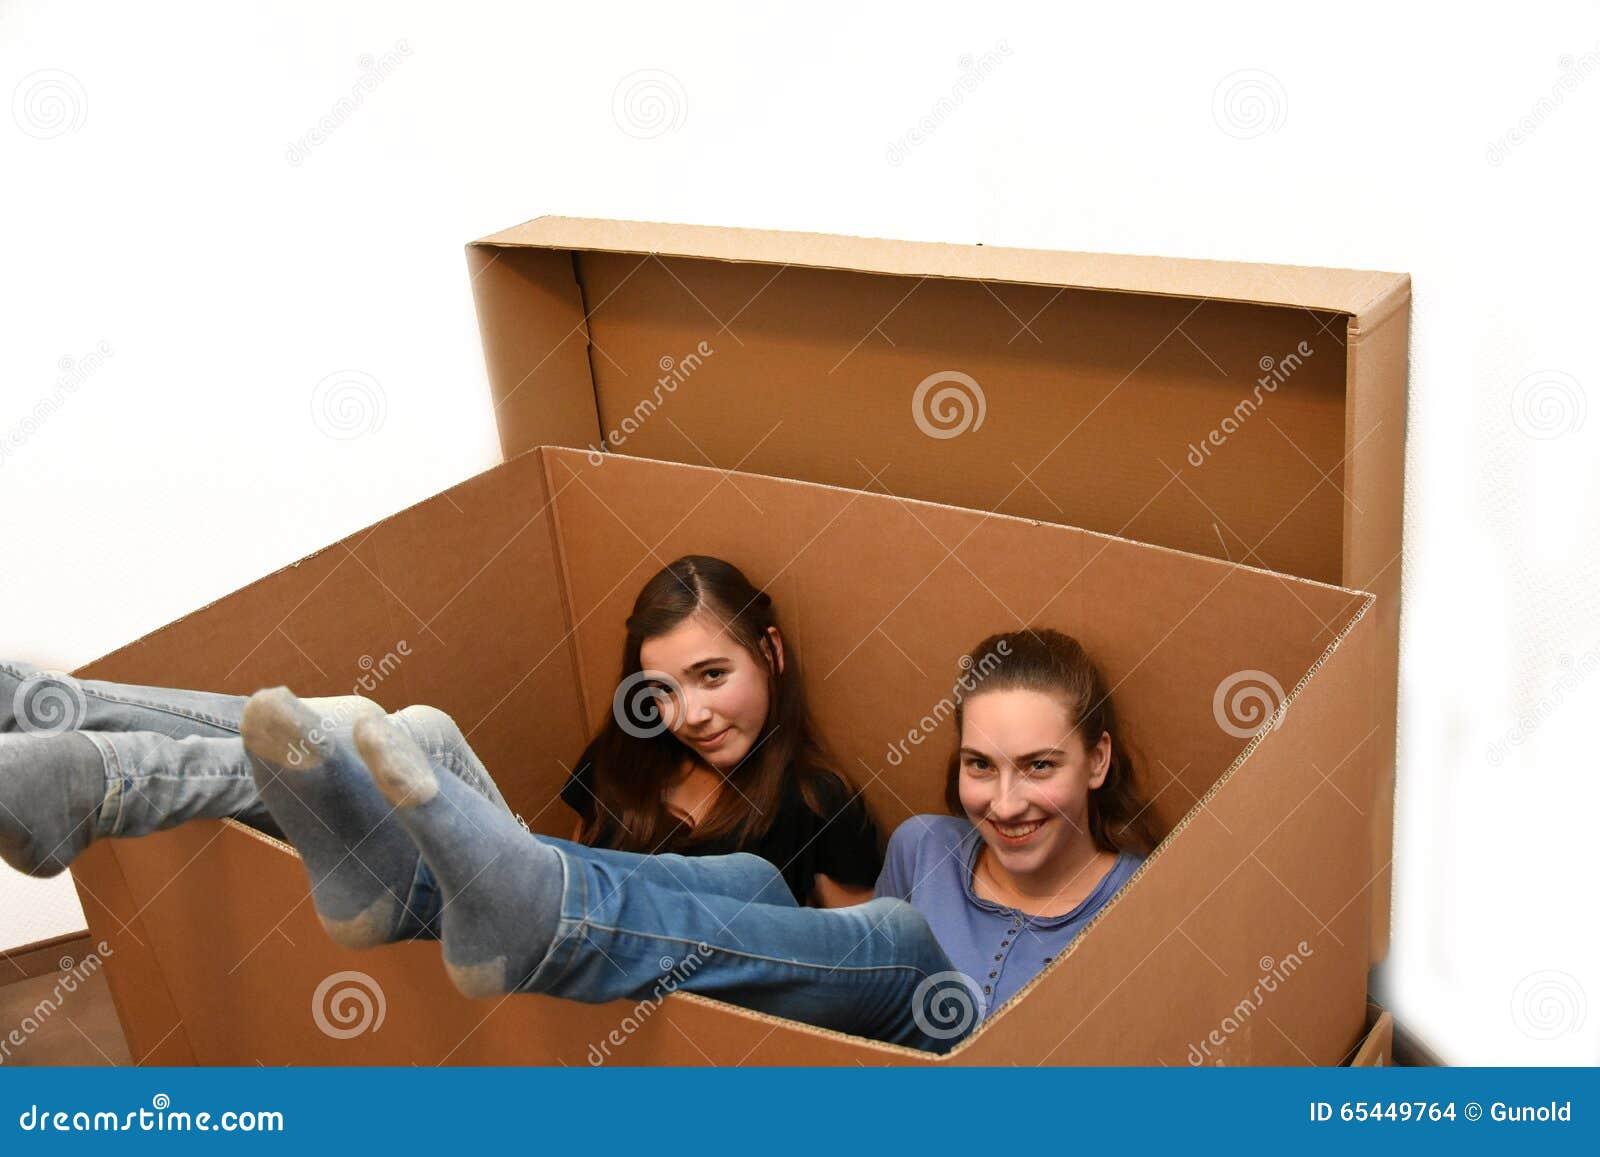 Girls in moving box